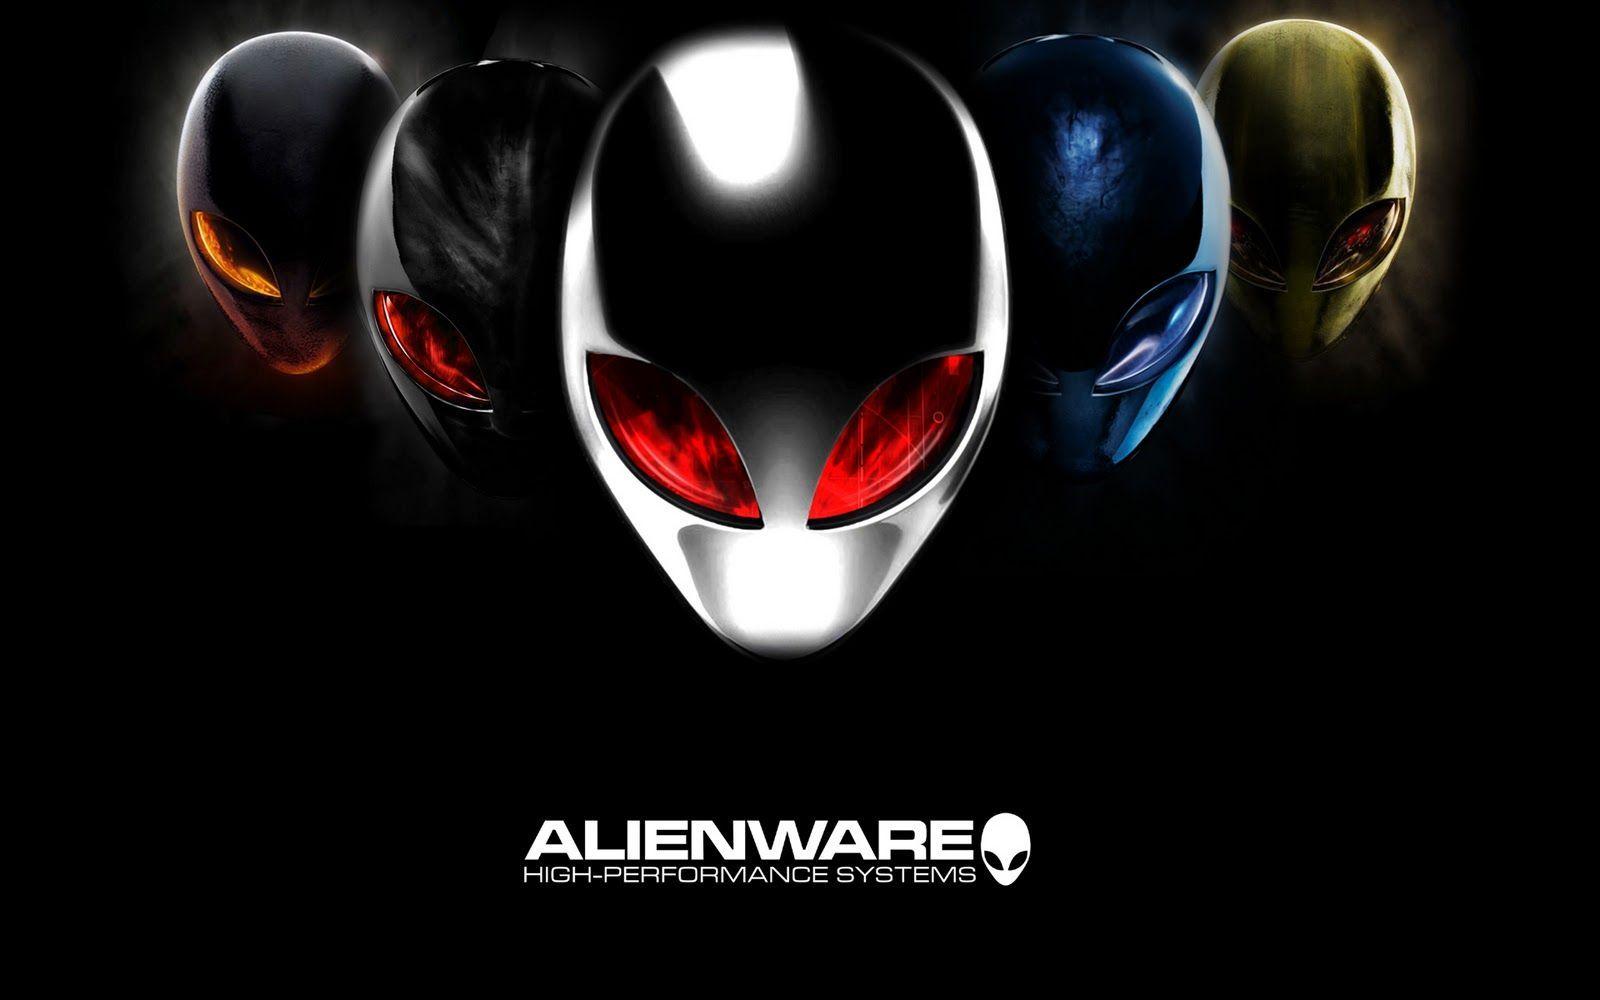 alienware hd wallpaper 58803